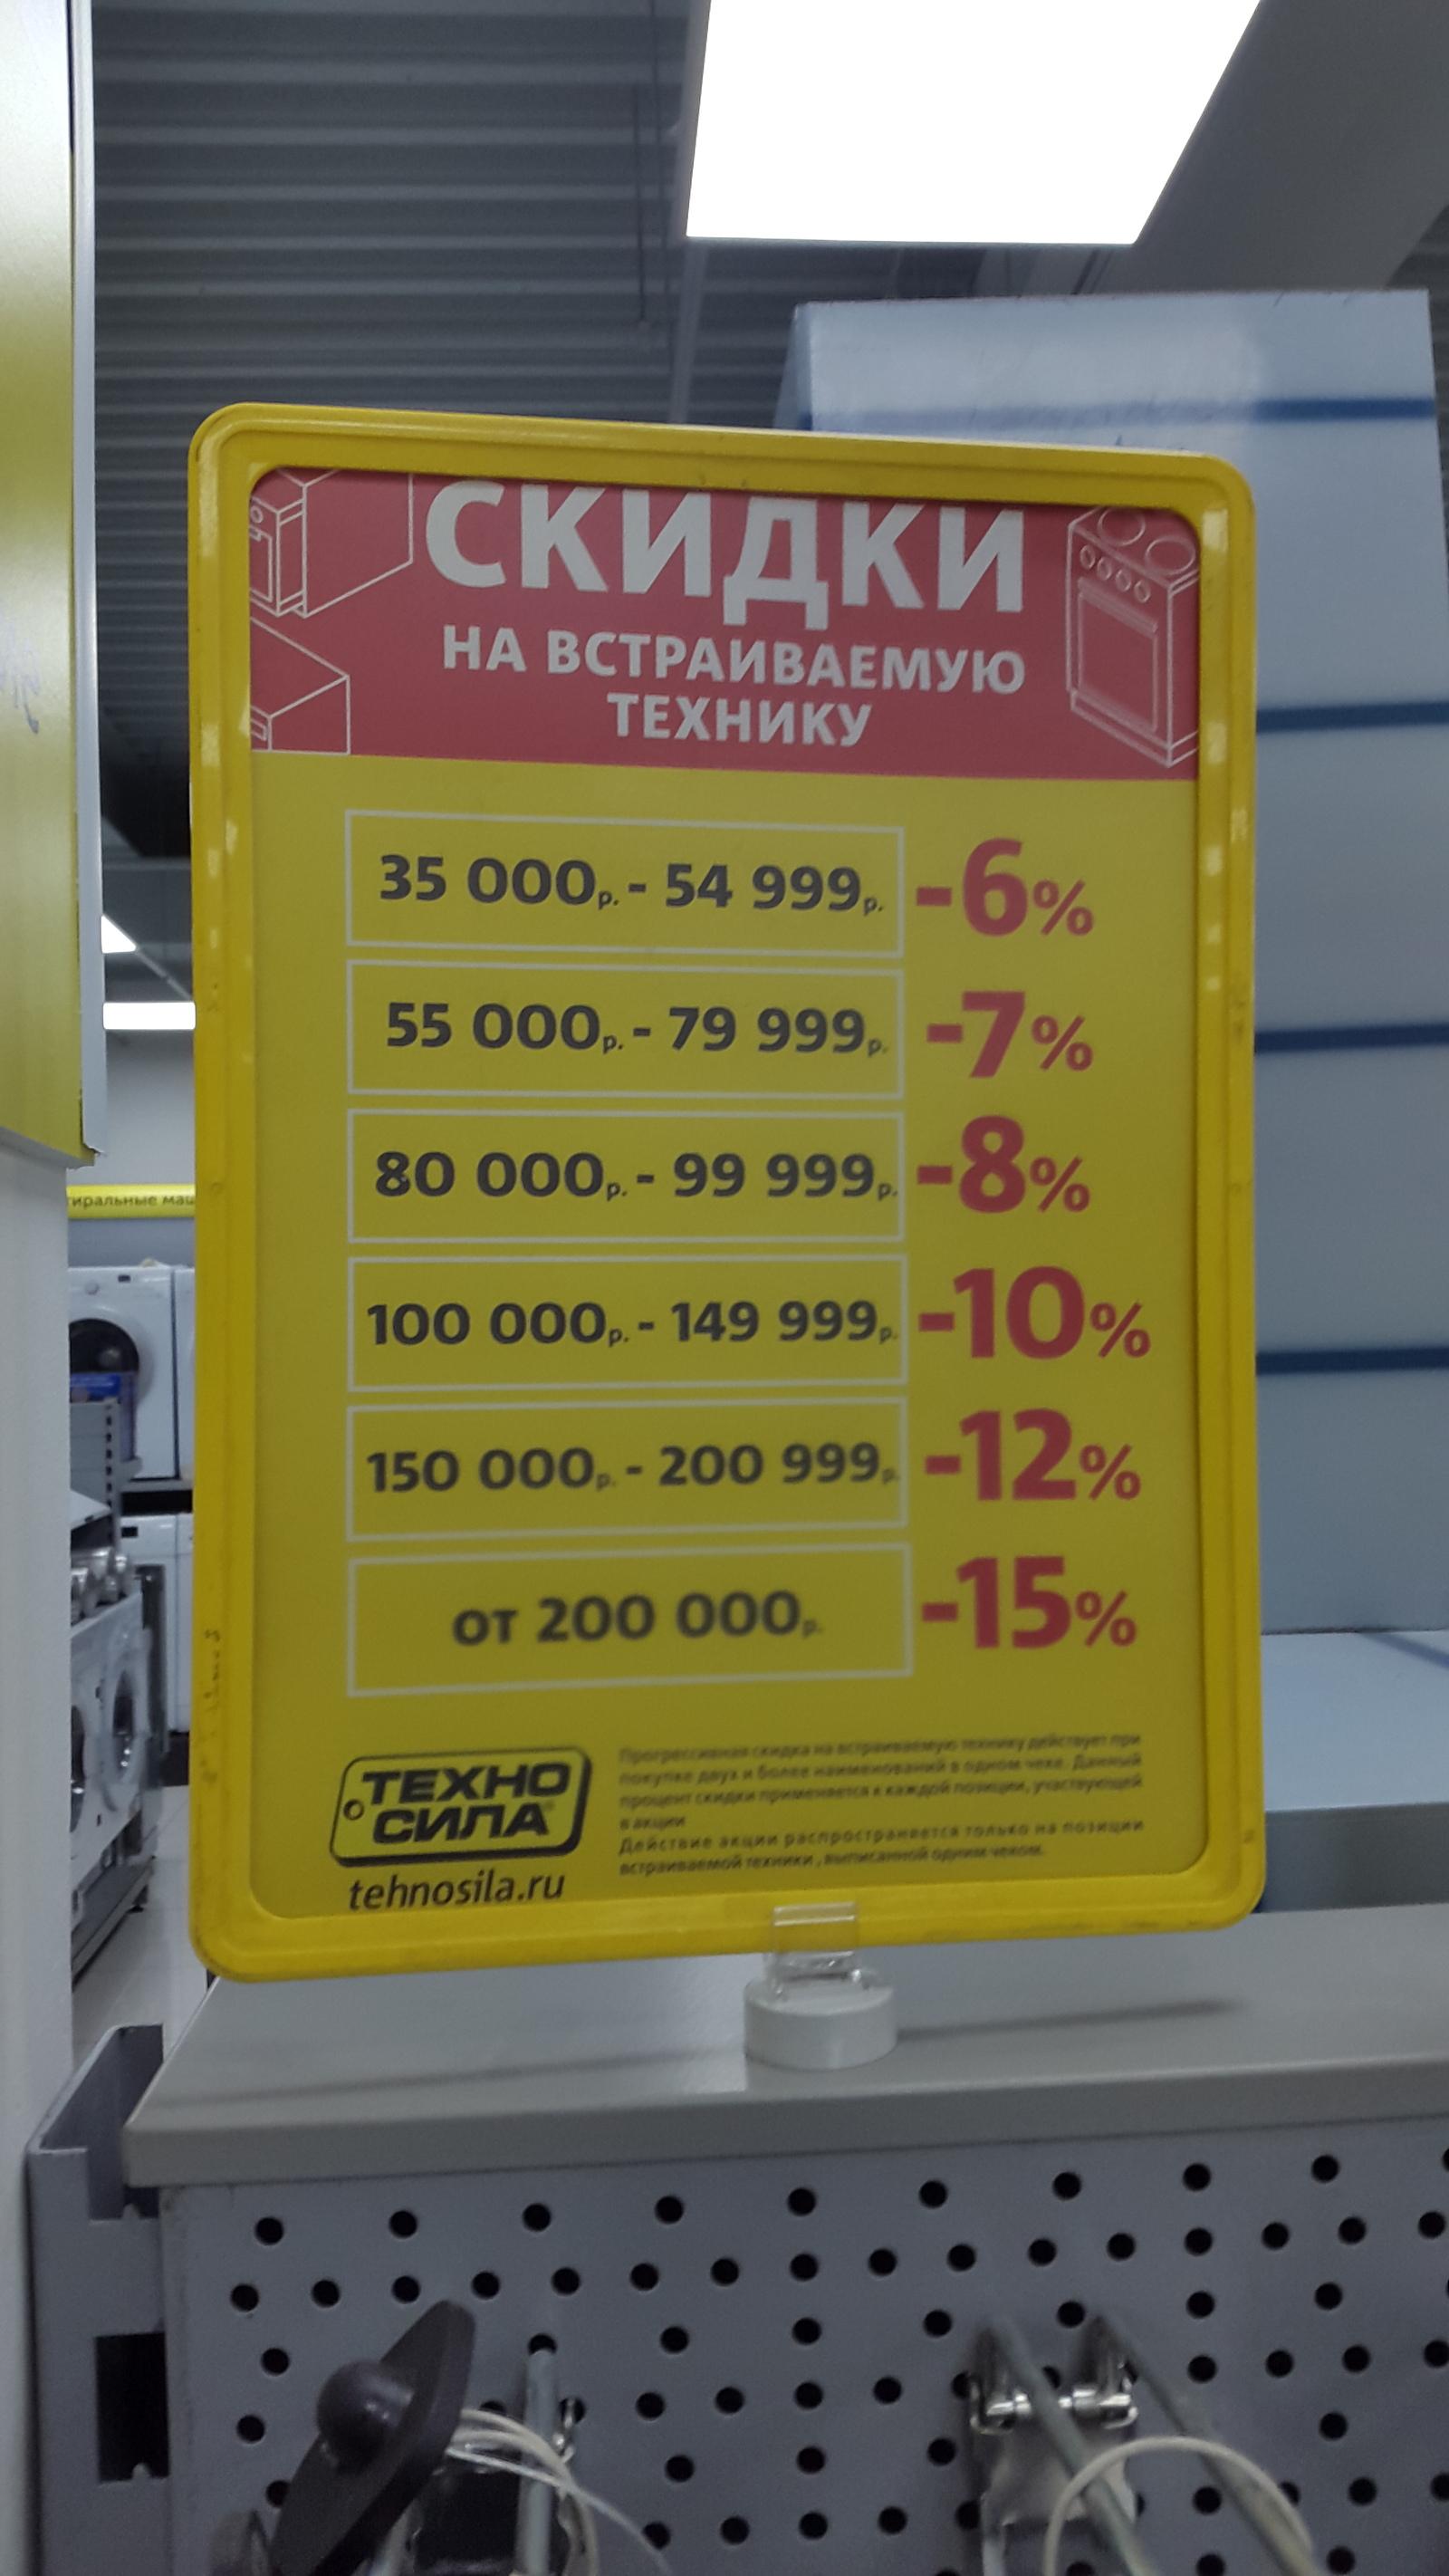 Публичная реклама товара 6 букв интернет реклама в мурманске